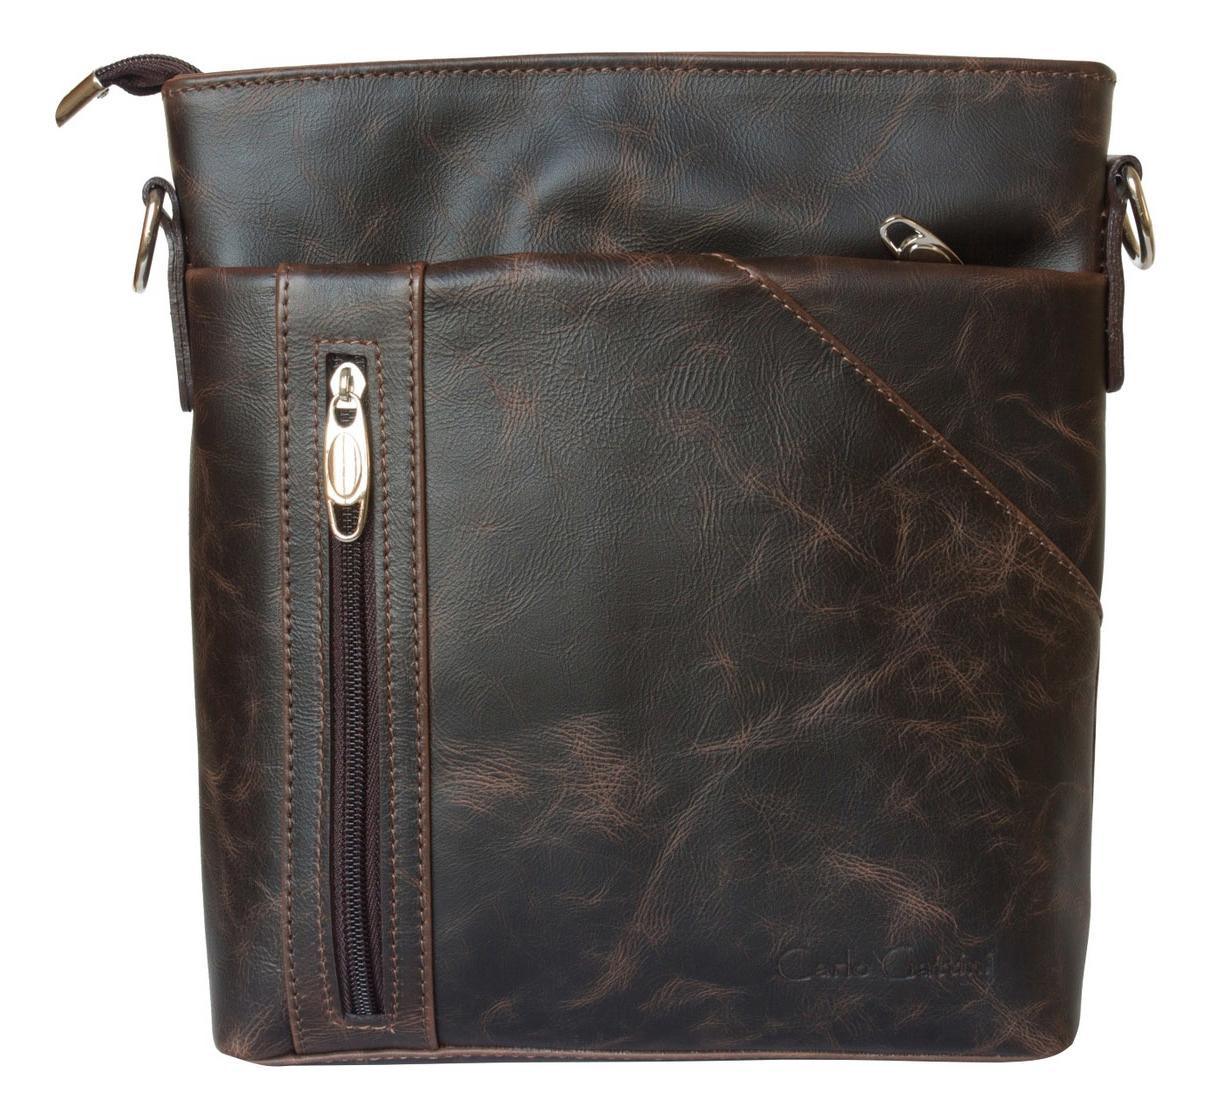 Сумка Lonato Brown 5011-02 сумка carlo gattini carlo gattini mp002xm0lzot